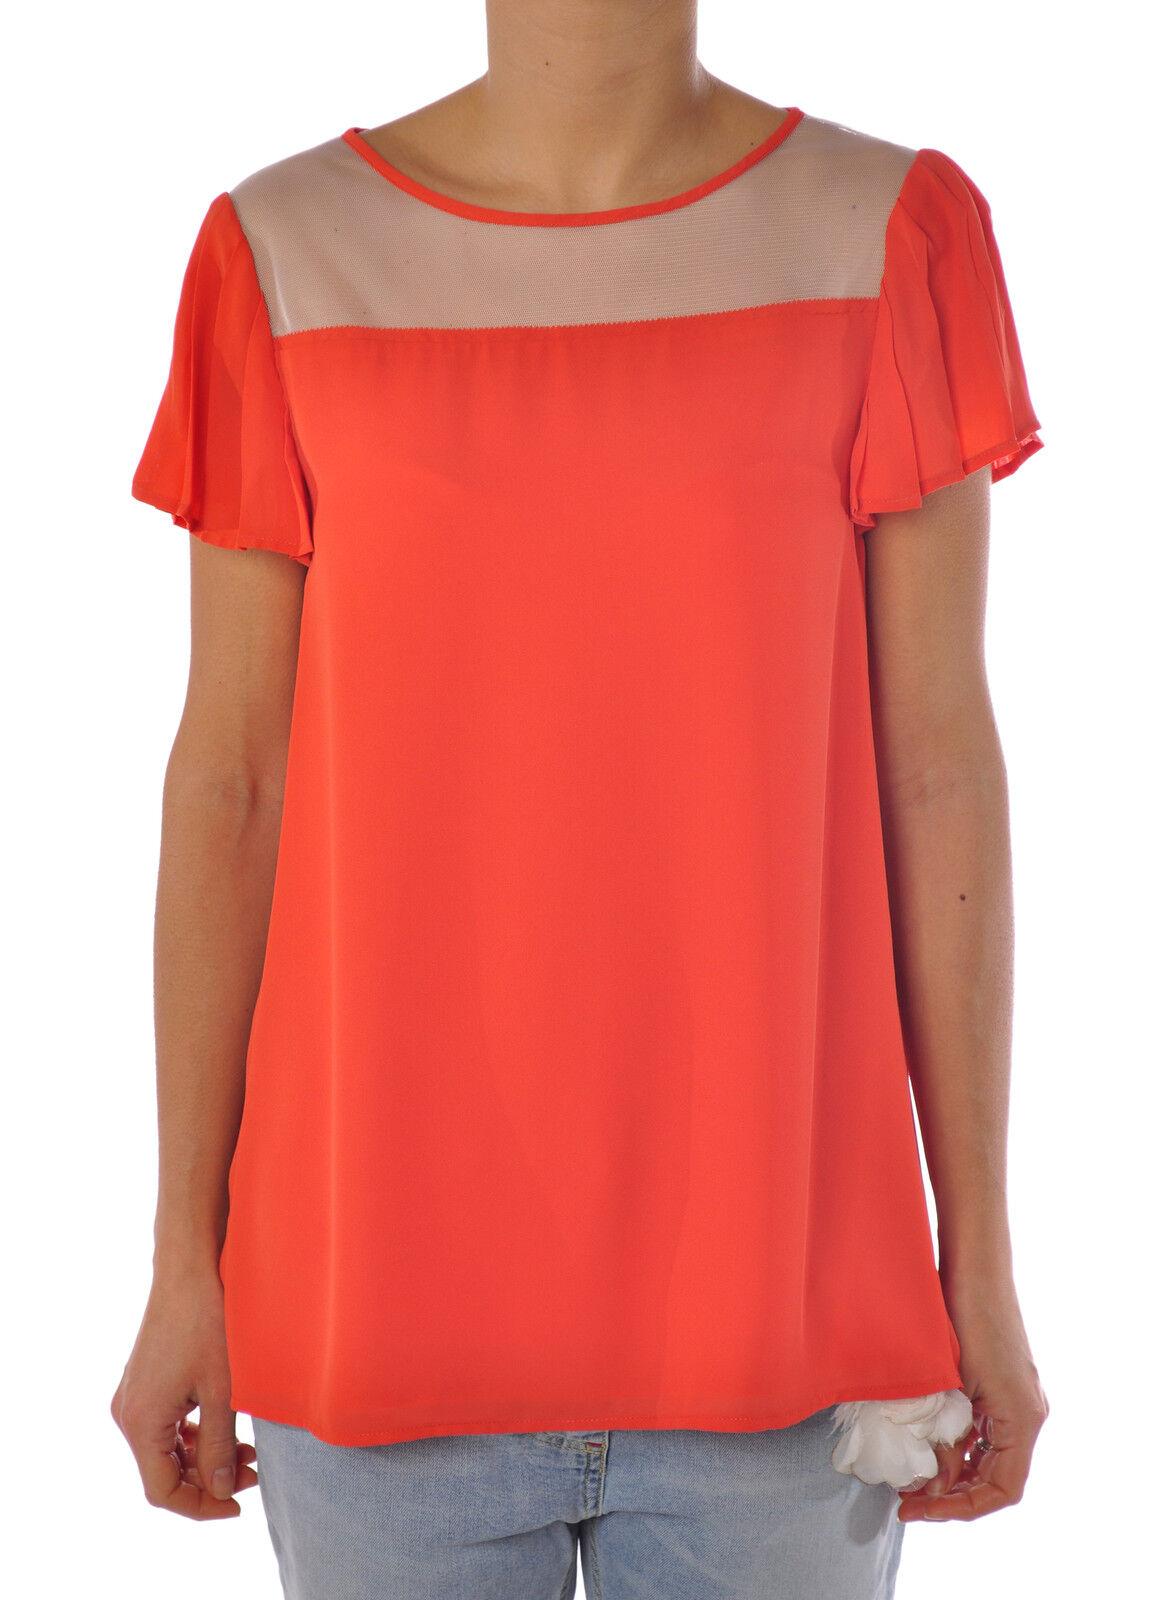 Patrizia Pepe  -  Blouses - Female - 42 - Orange - 1377905B163224